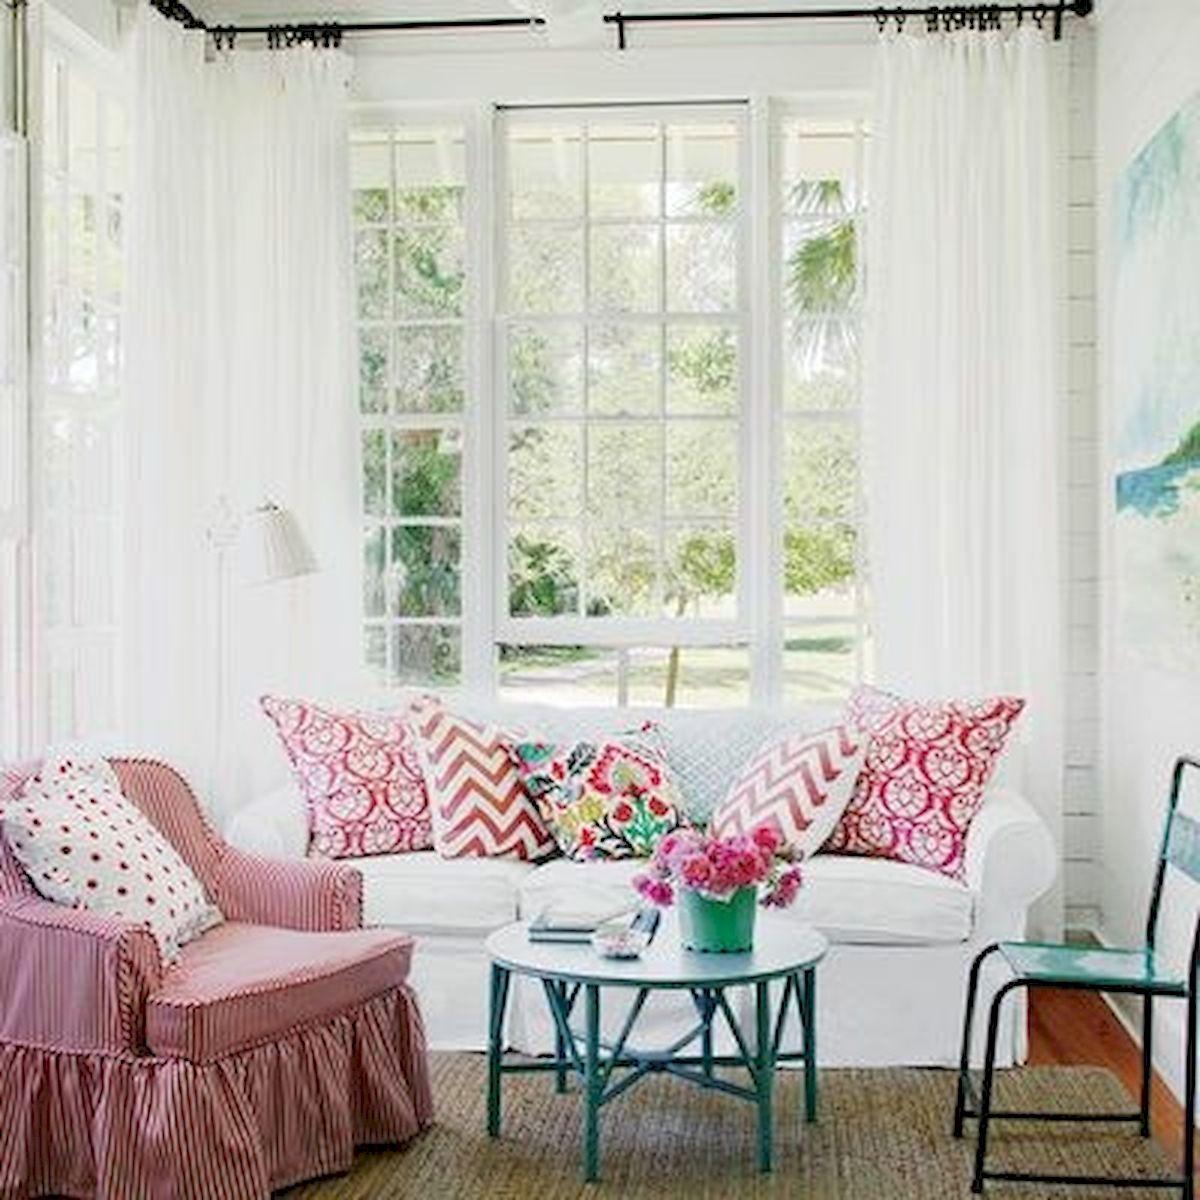 45 Colorful Interior Home Design and Decor Ideas (42)